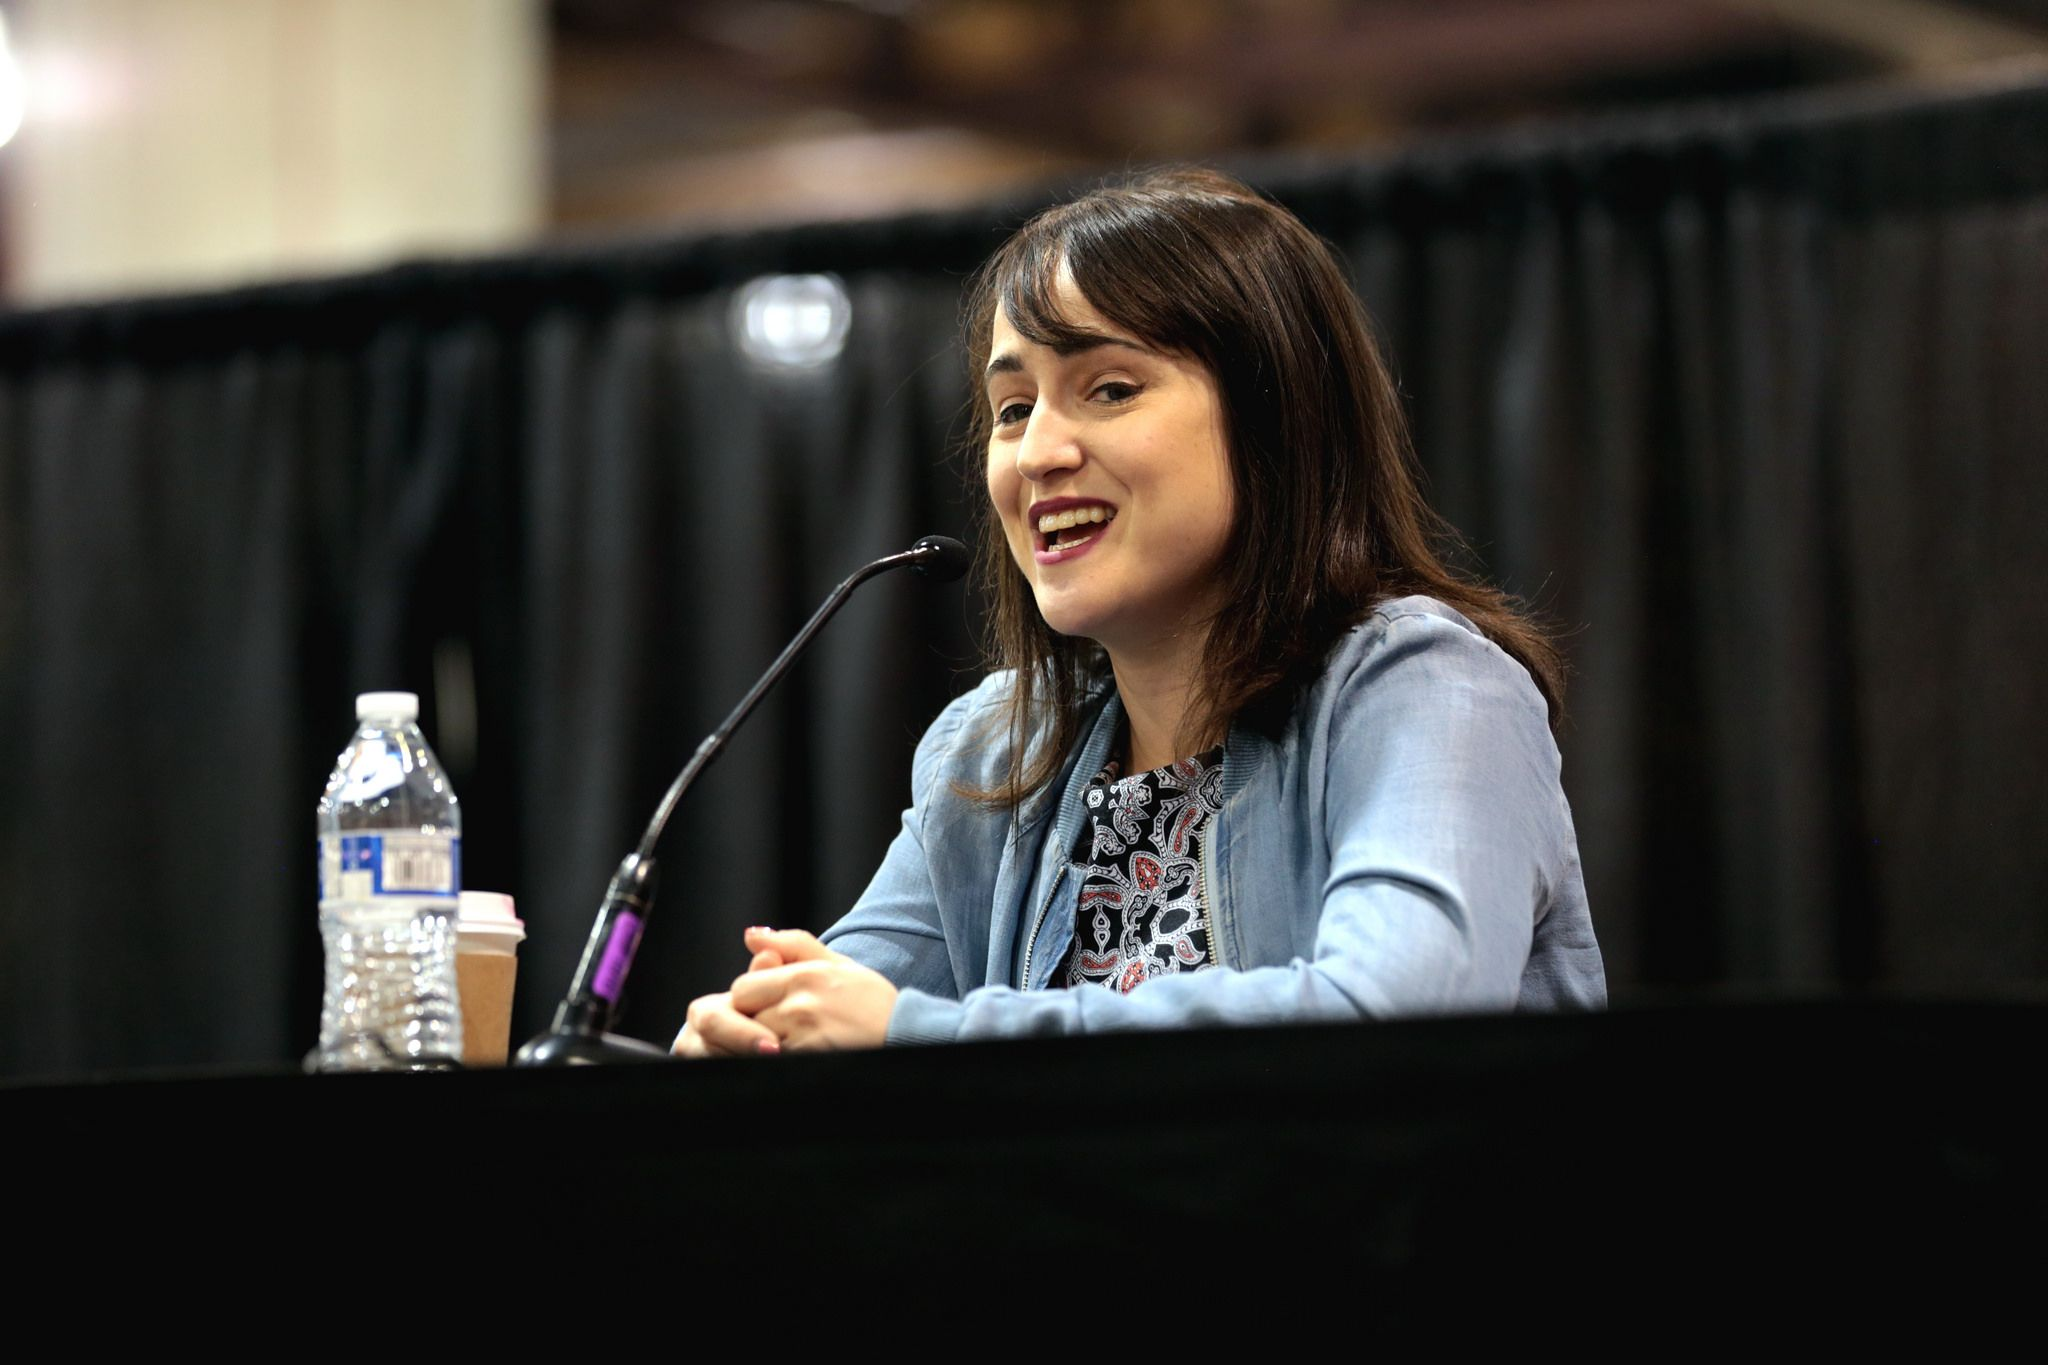 Mara Wilson Mara Wilson Comicon Role Models